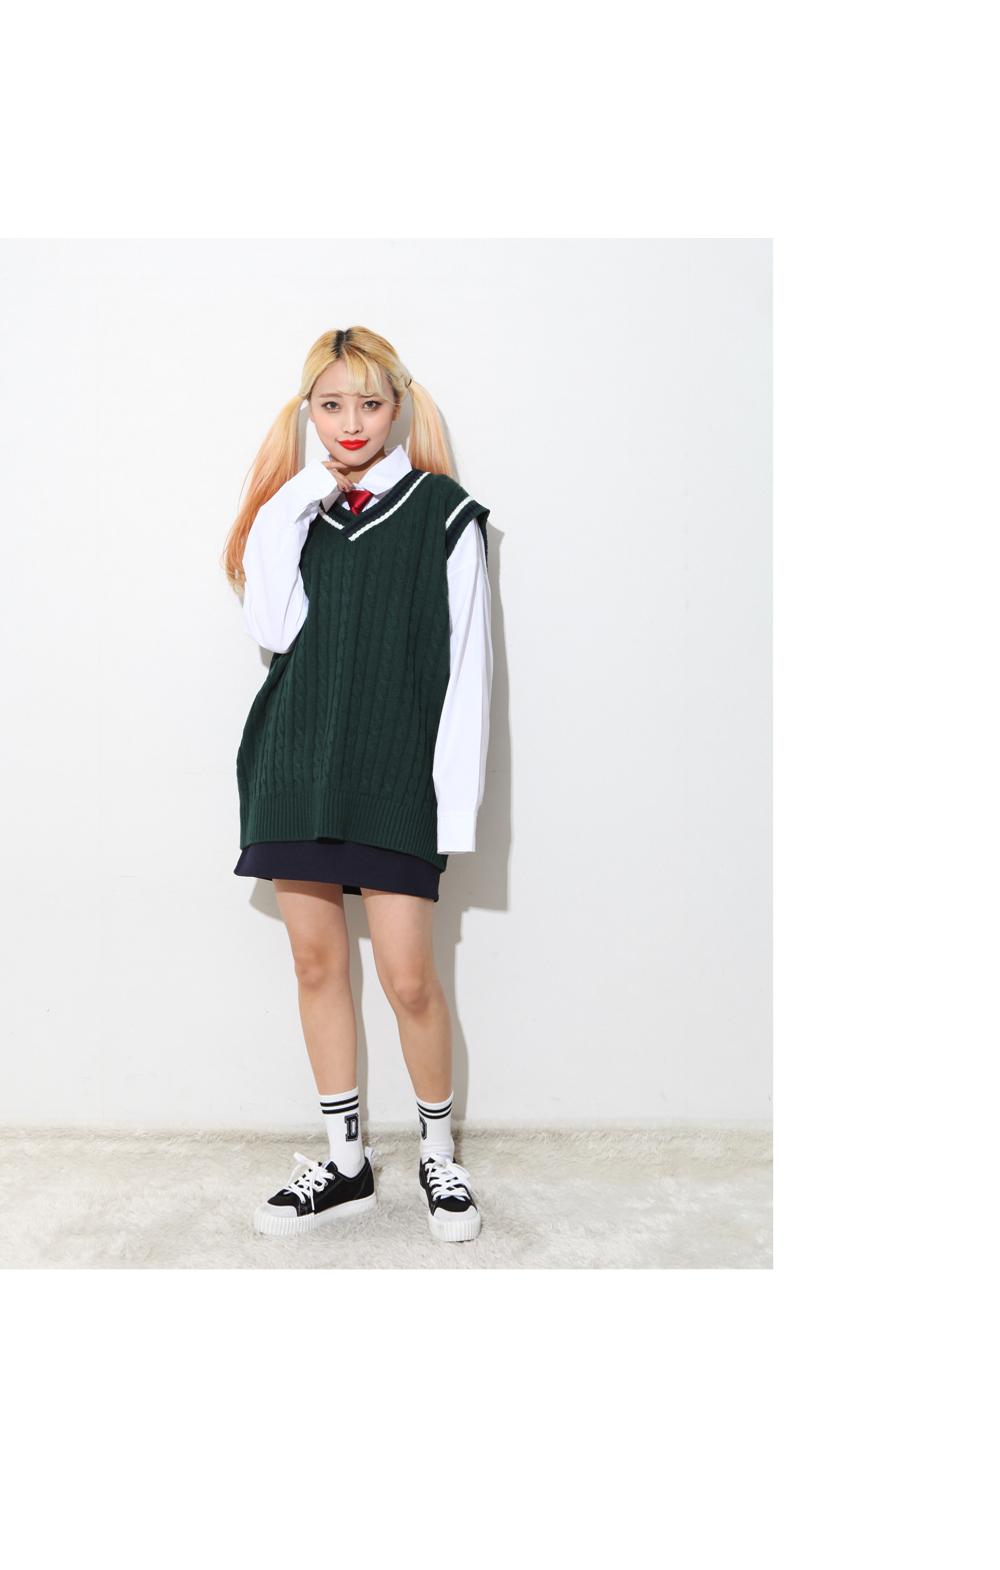 Peter Pan School Knit Vest